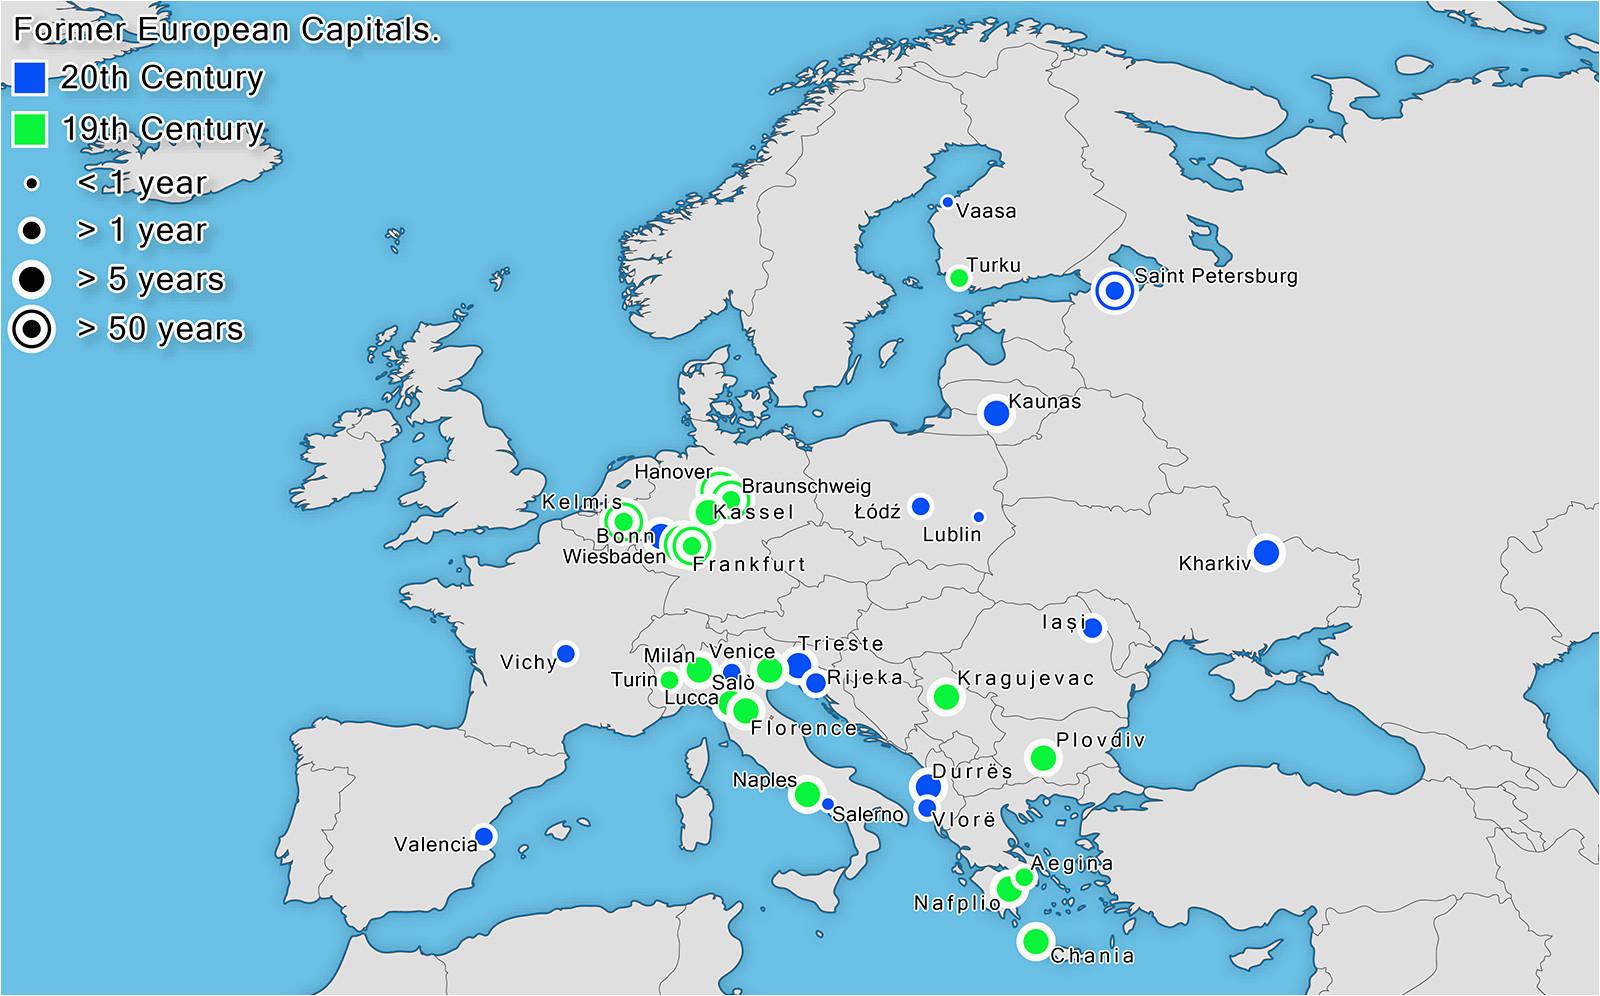 former european capitals oc 1600x996 mapporn